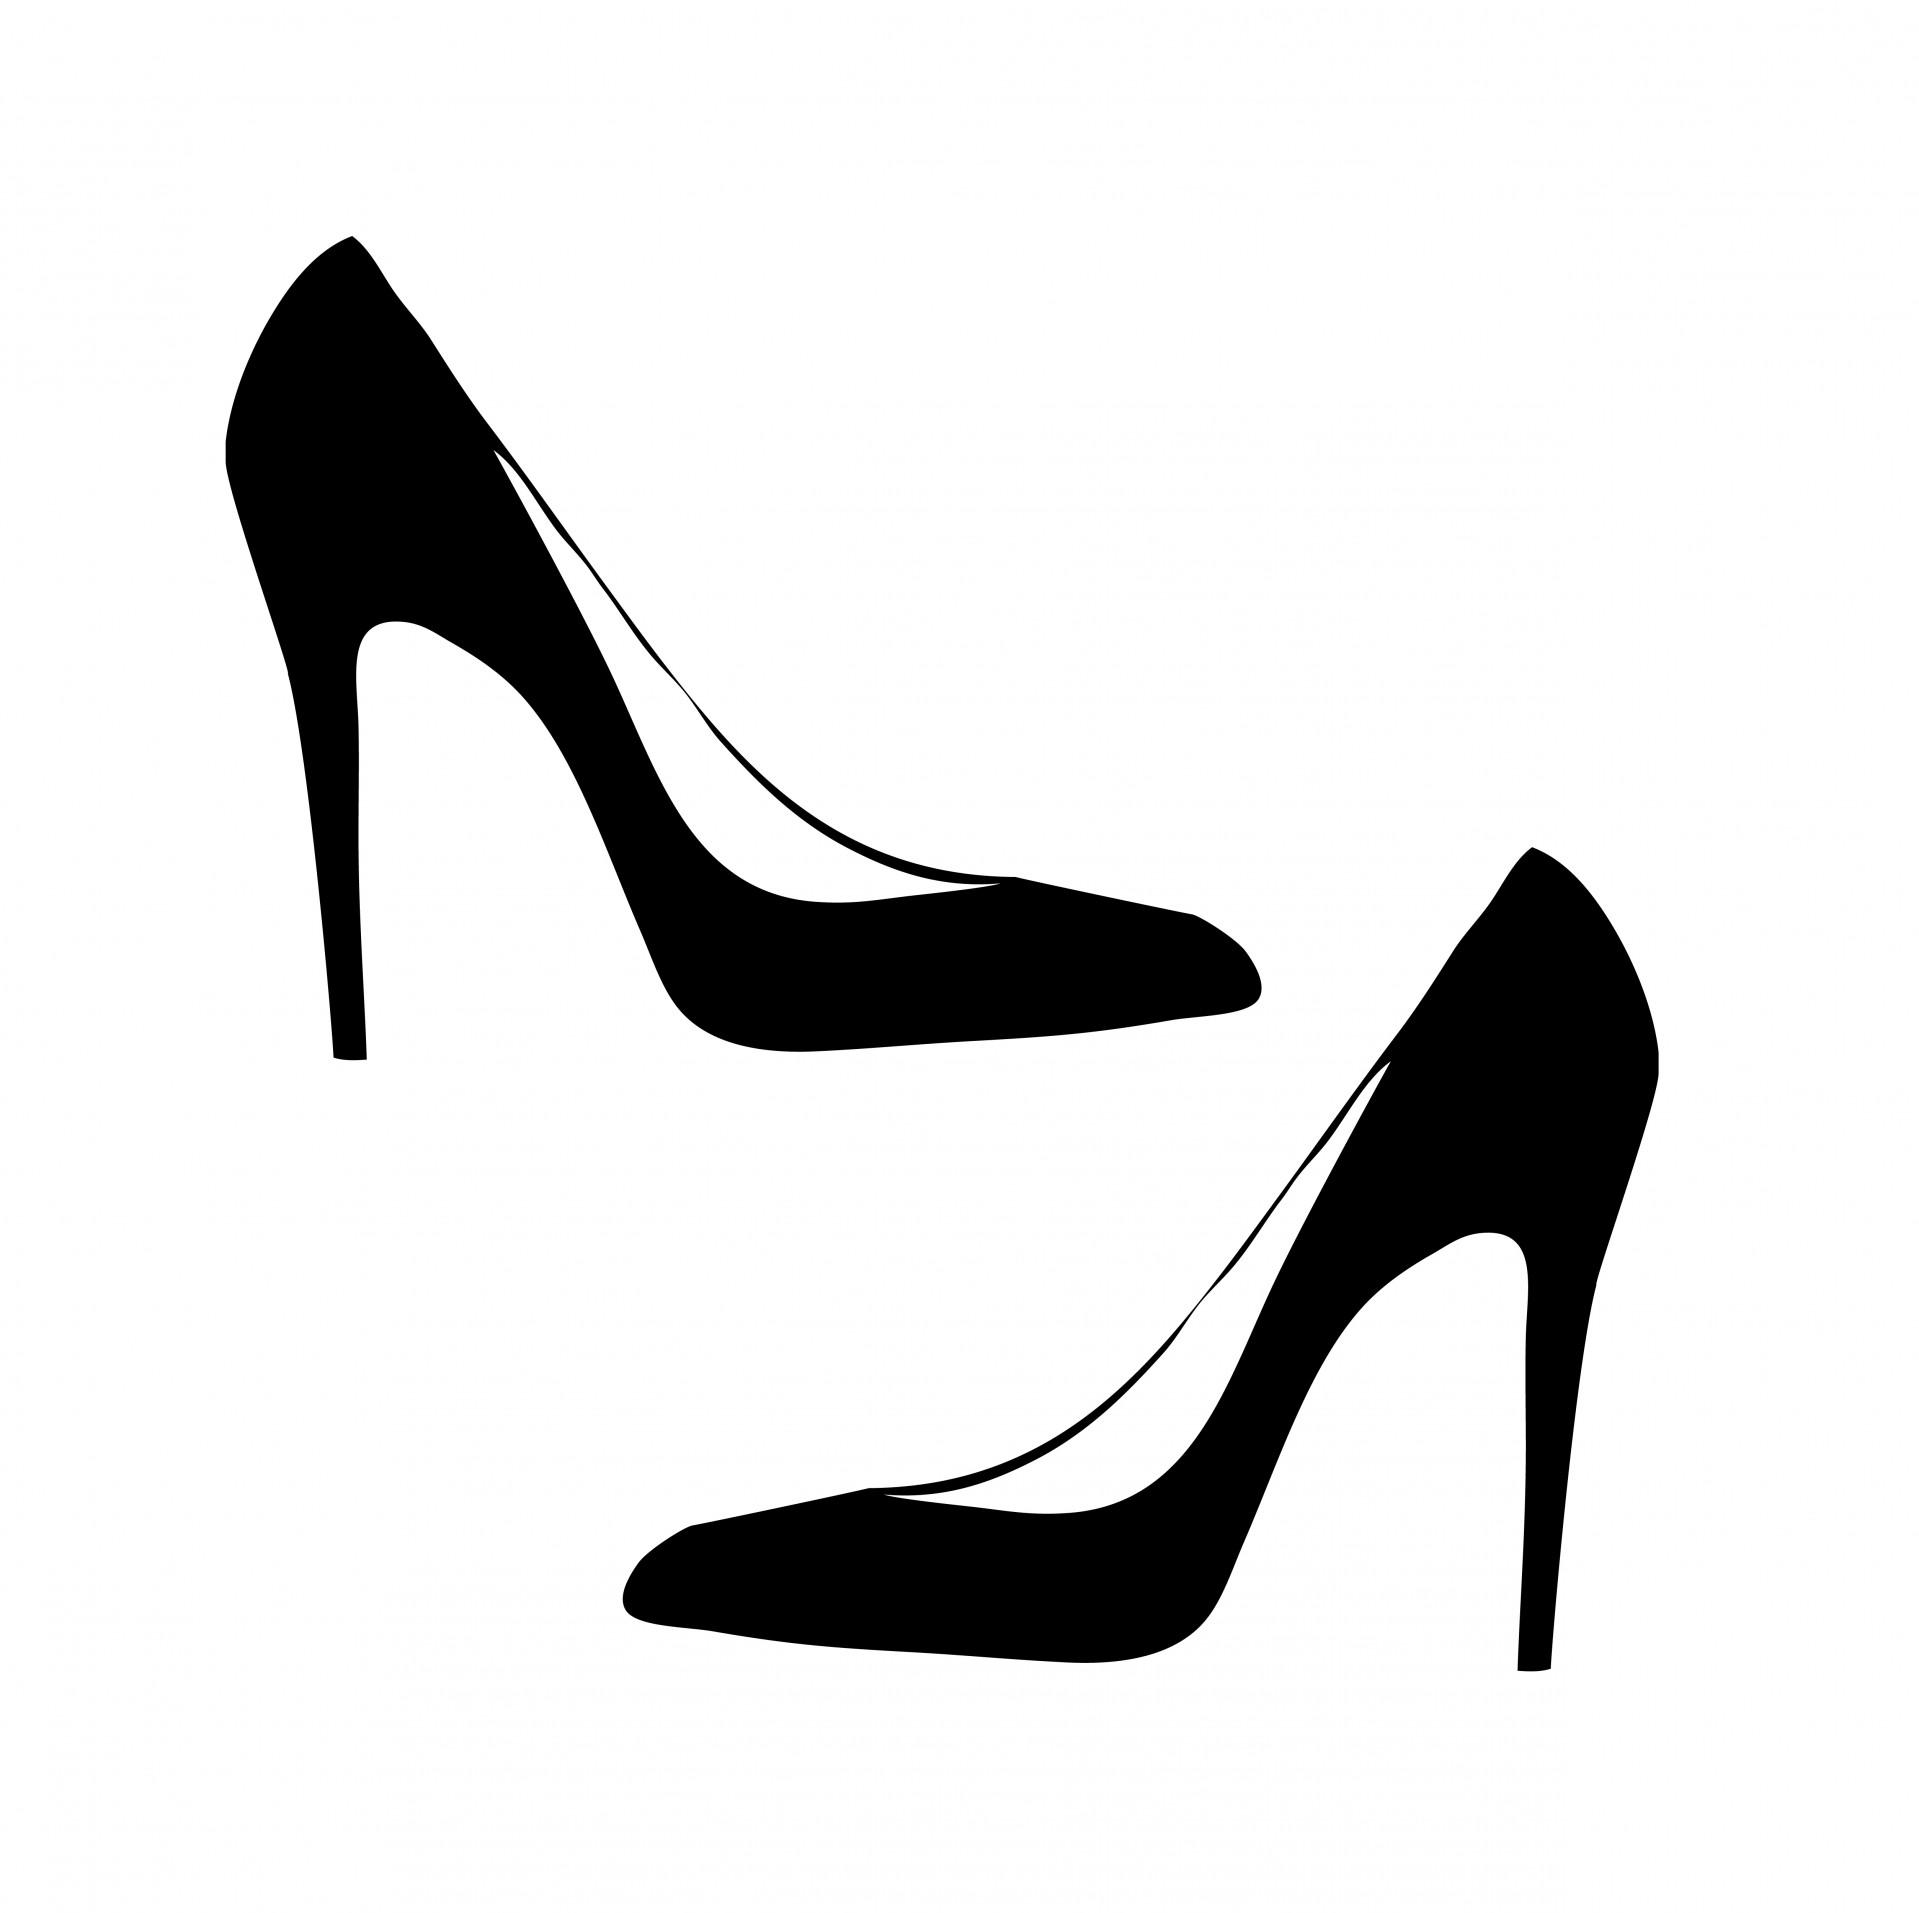 Heels clipart women's shoe Public Black Stock For Black